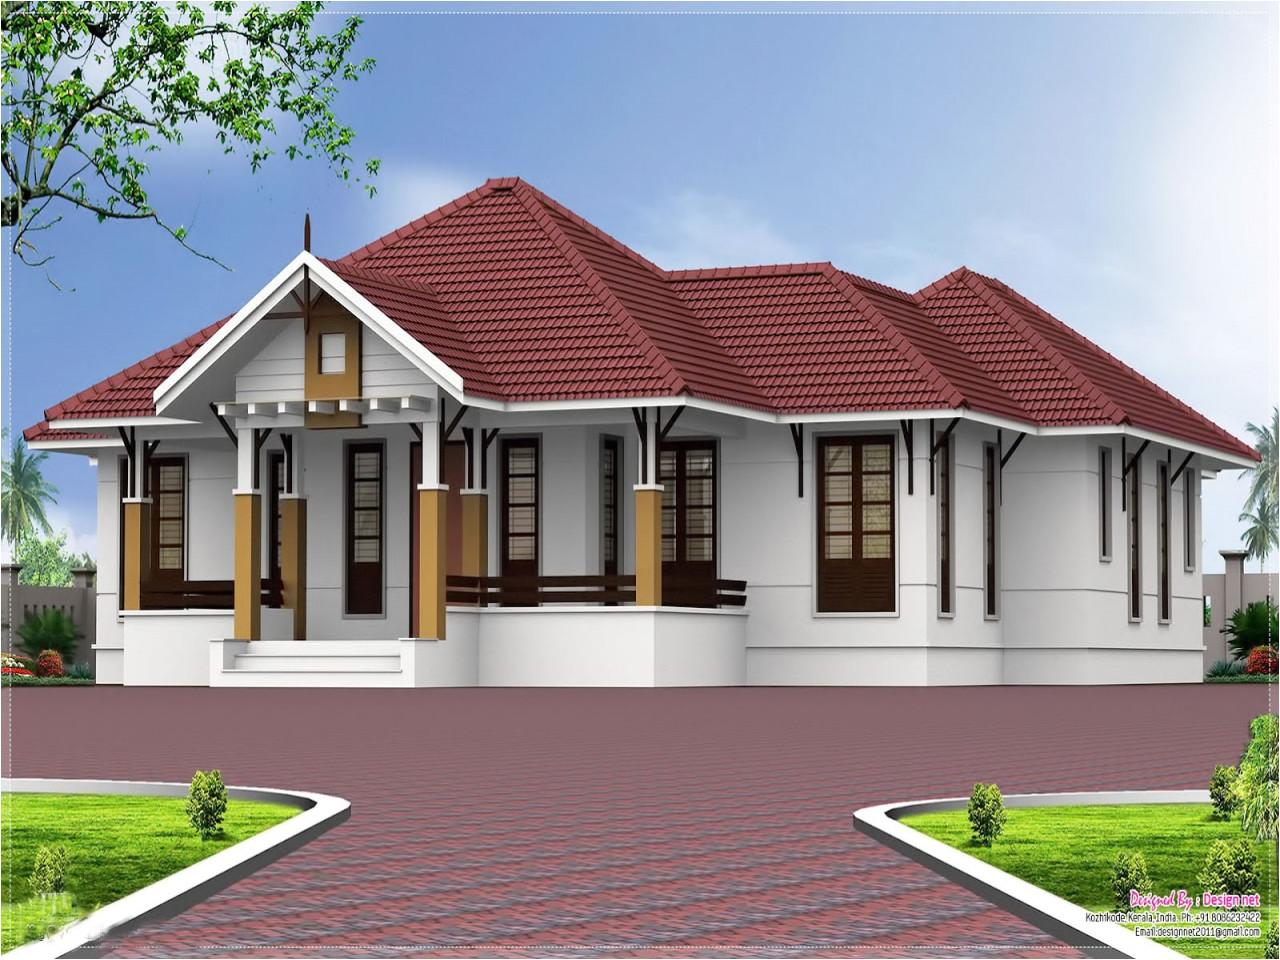 6cbbdbb4111facf1 single floor kerala home design kerala single floor 4 bedroom house plans